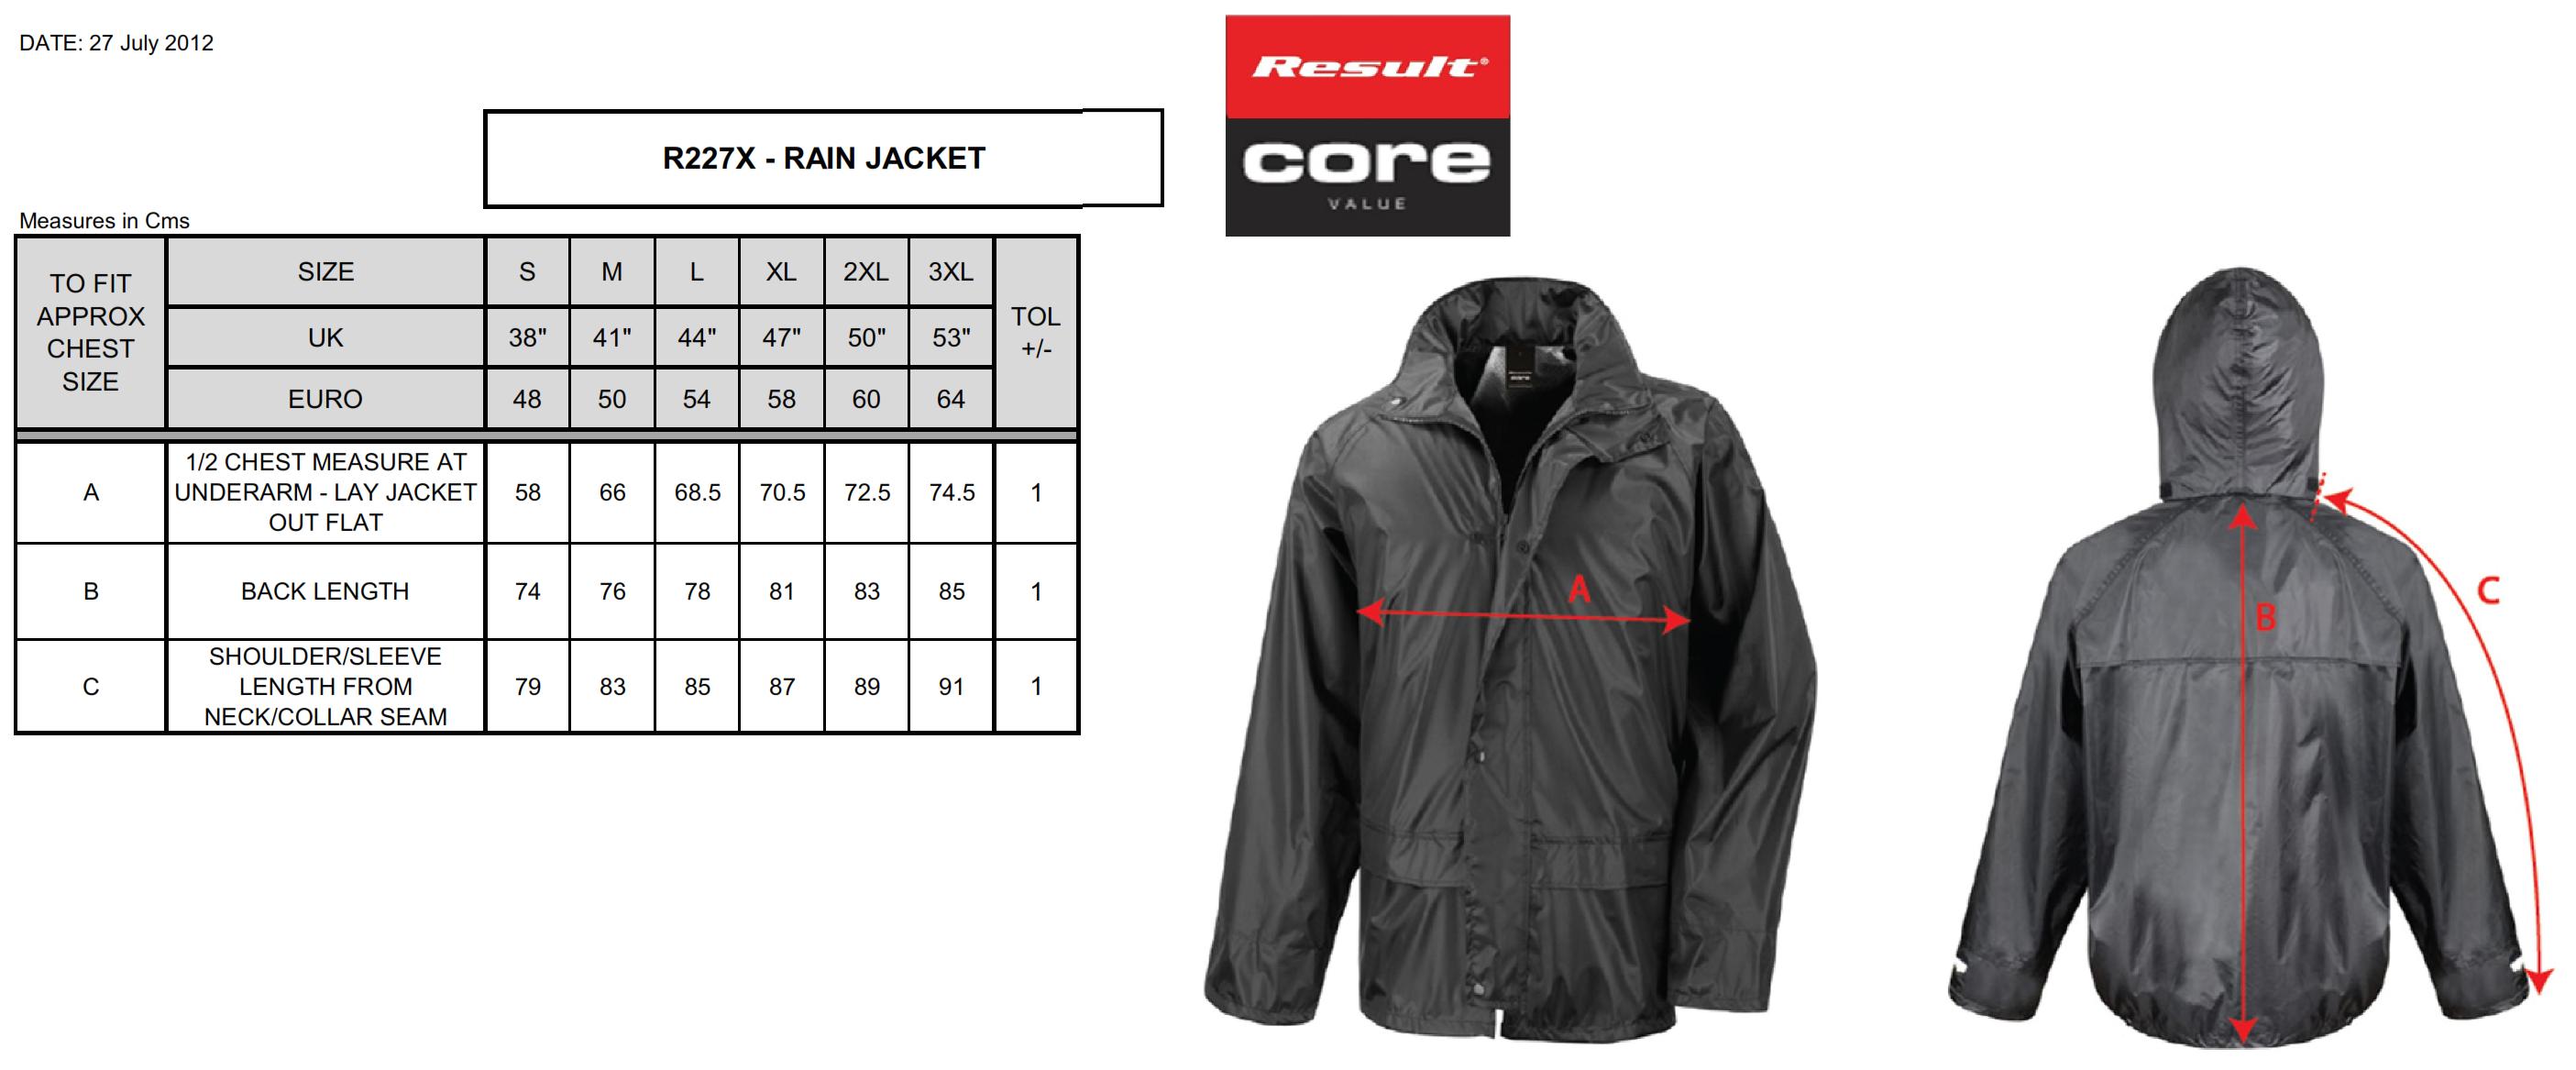 Result: StormDri Jacket R227X